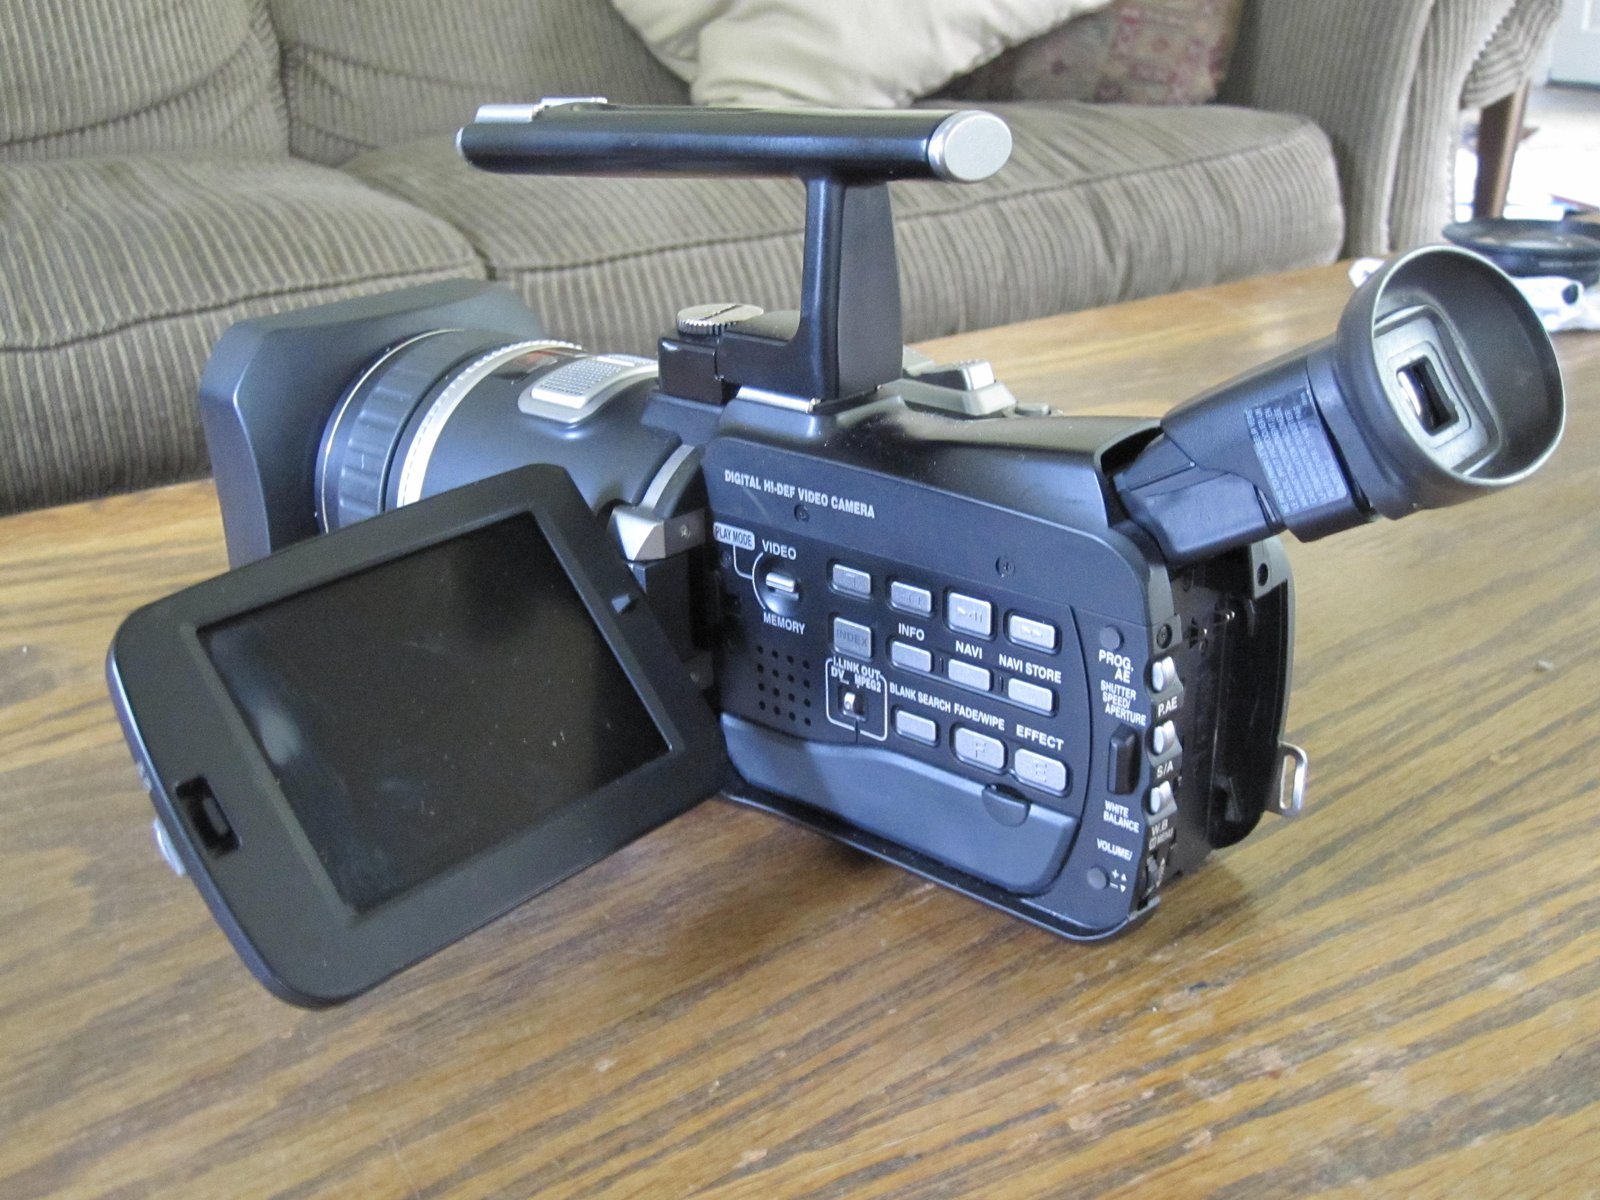 #4 camera